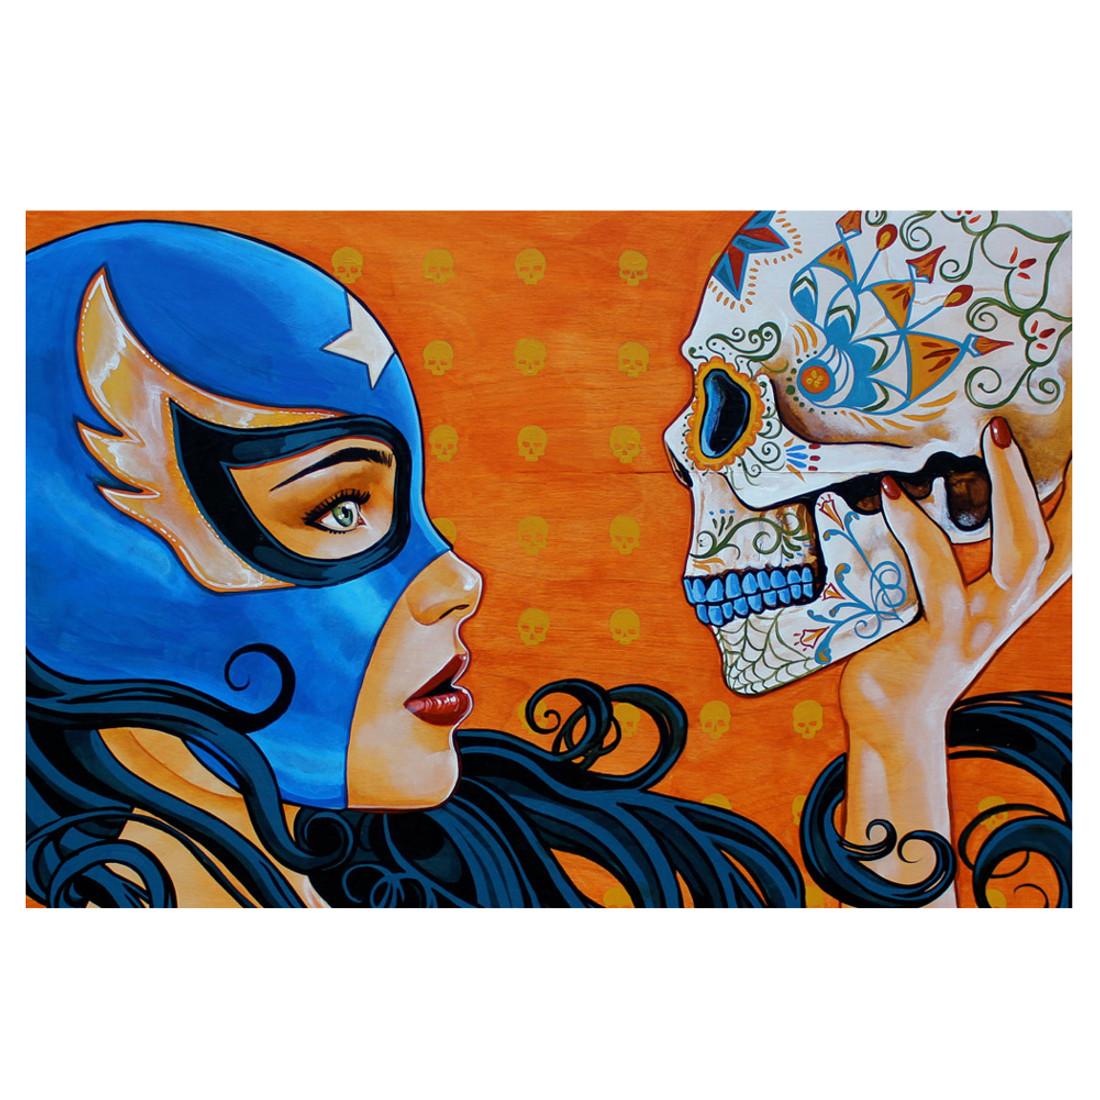 Mike Bell Mascara de la Muerte Art Print